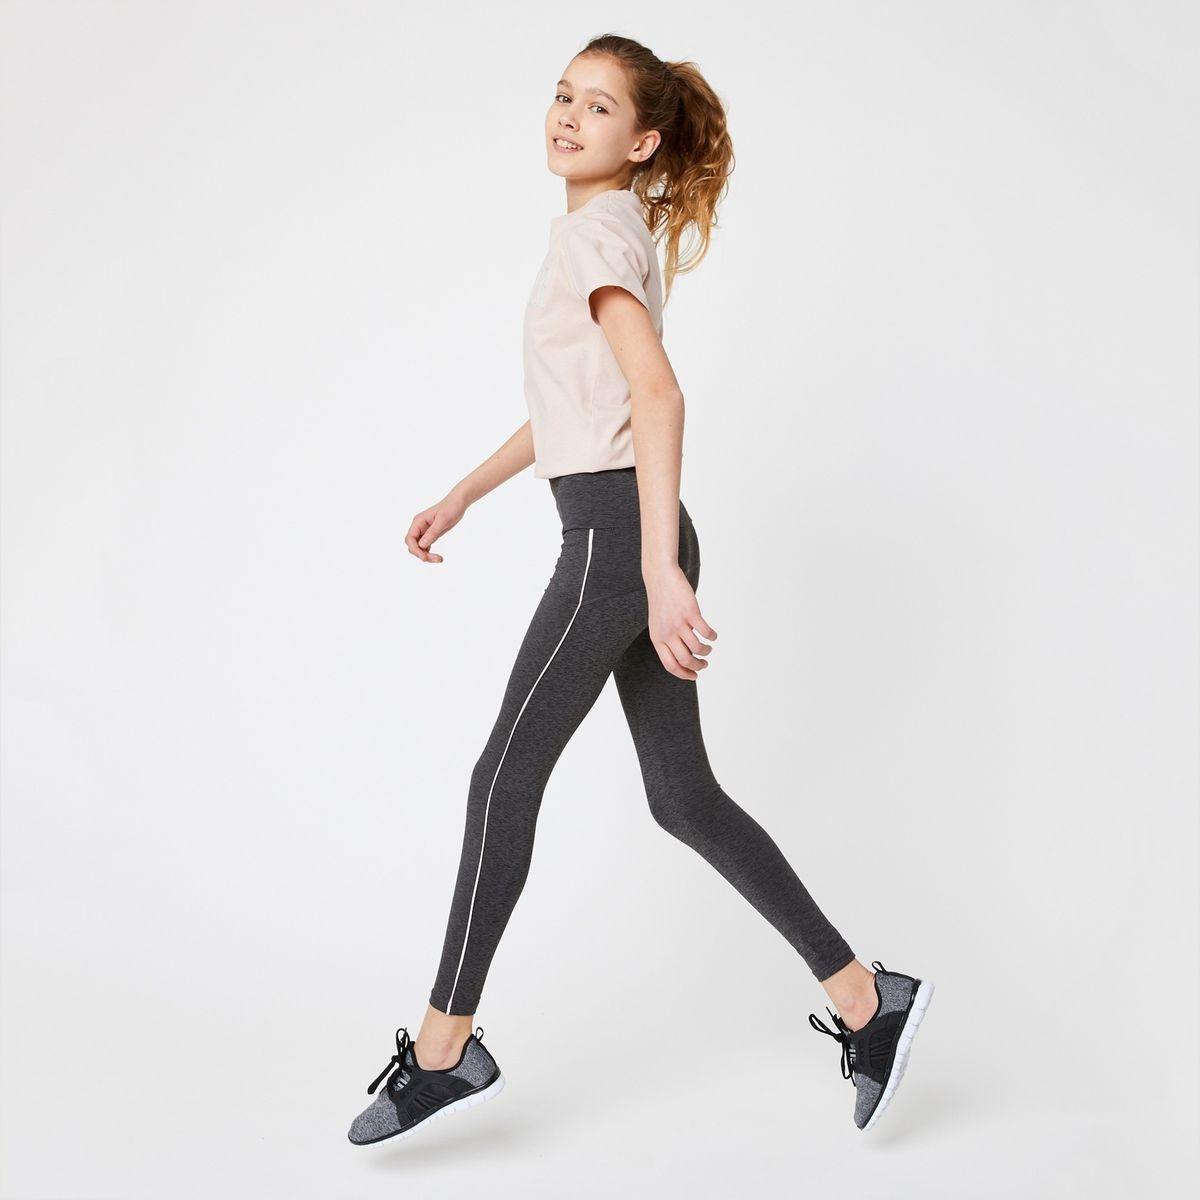 Legging - Monoprix Fit